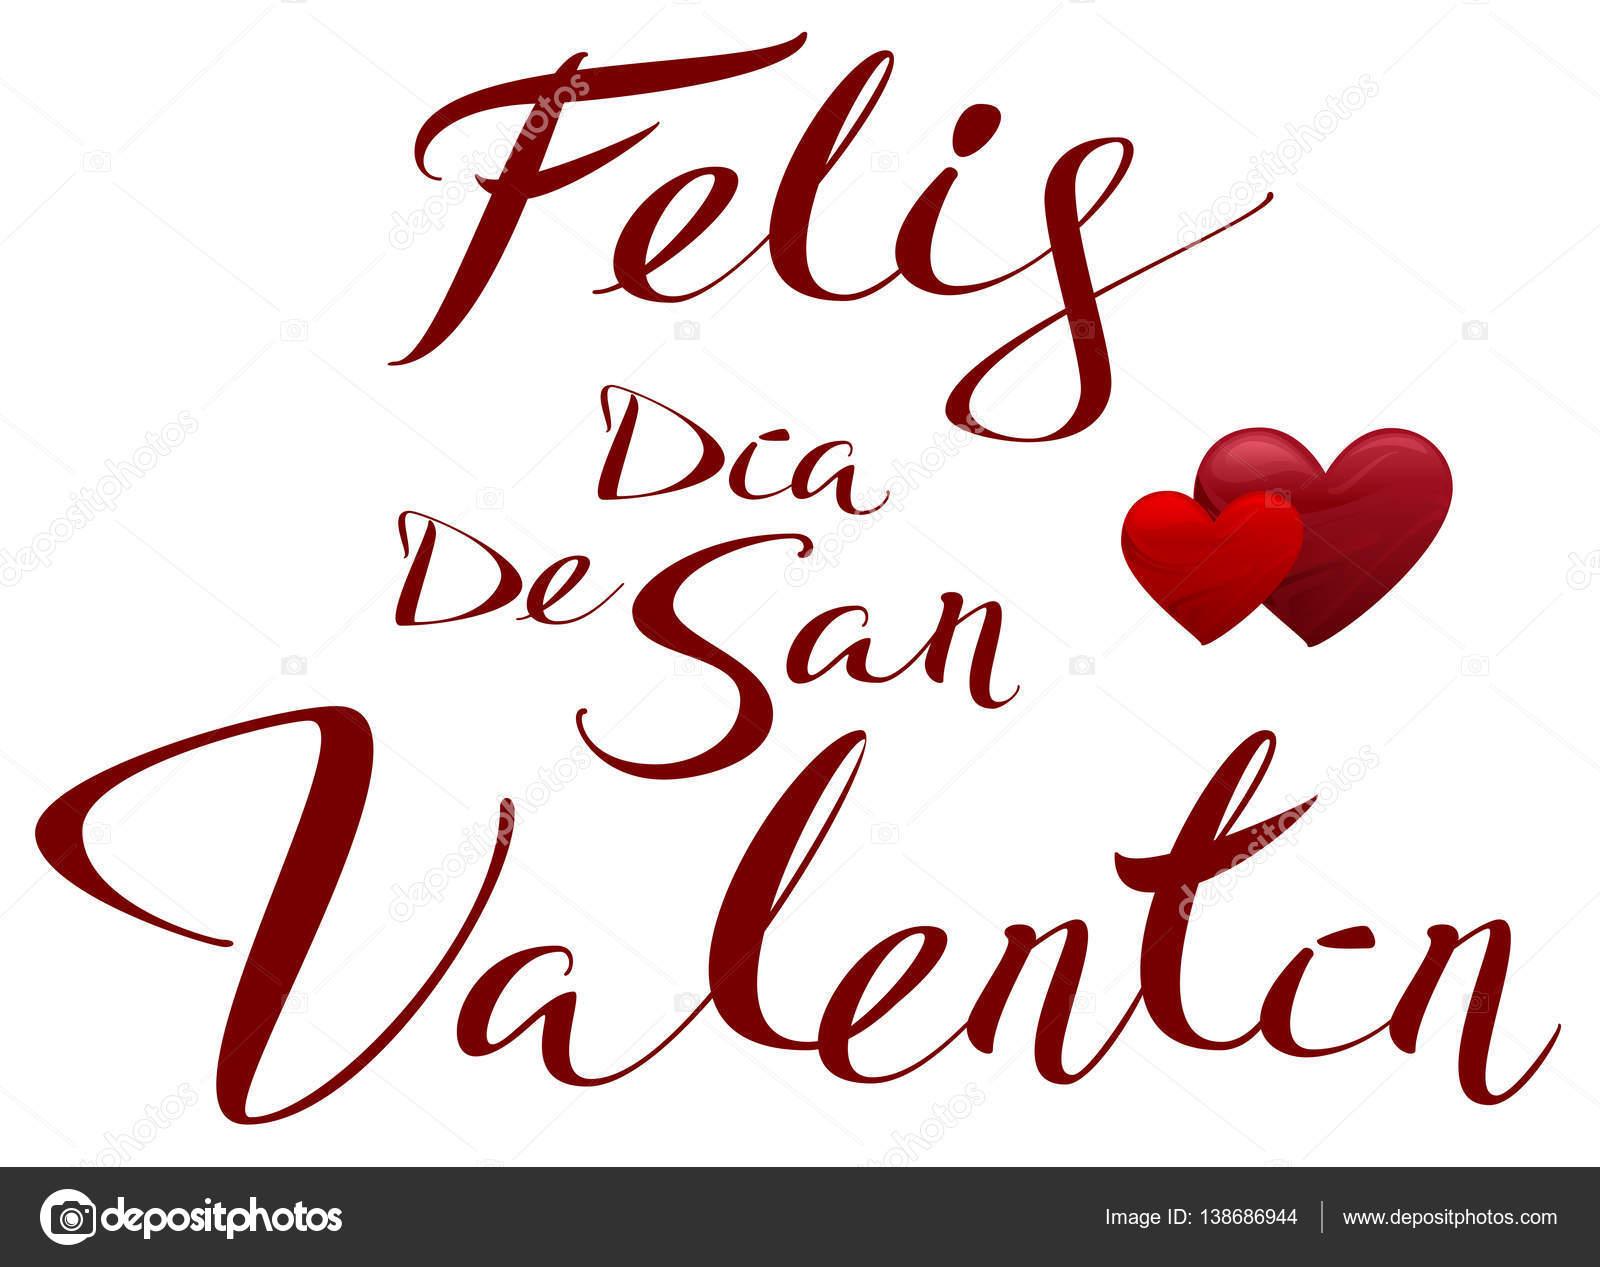 Happy Valentines Translated From Spanish Feliz Dia De San Valentin